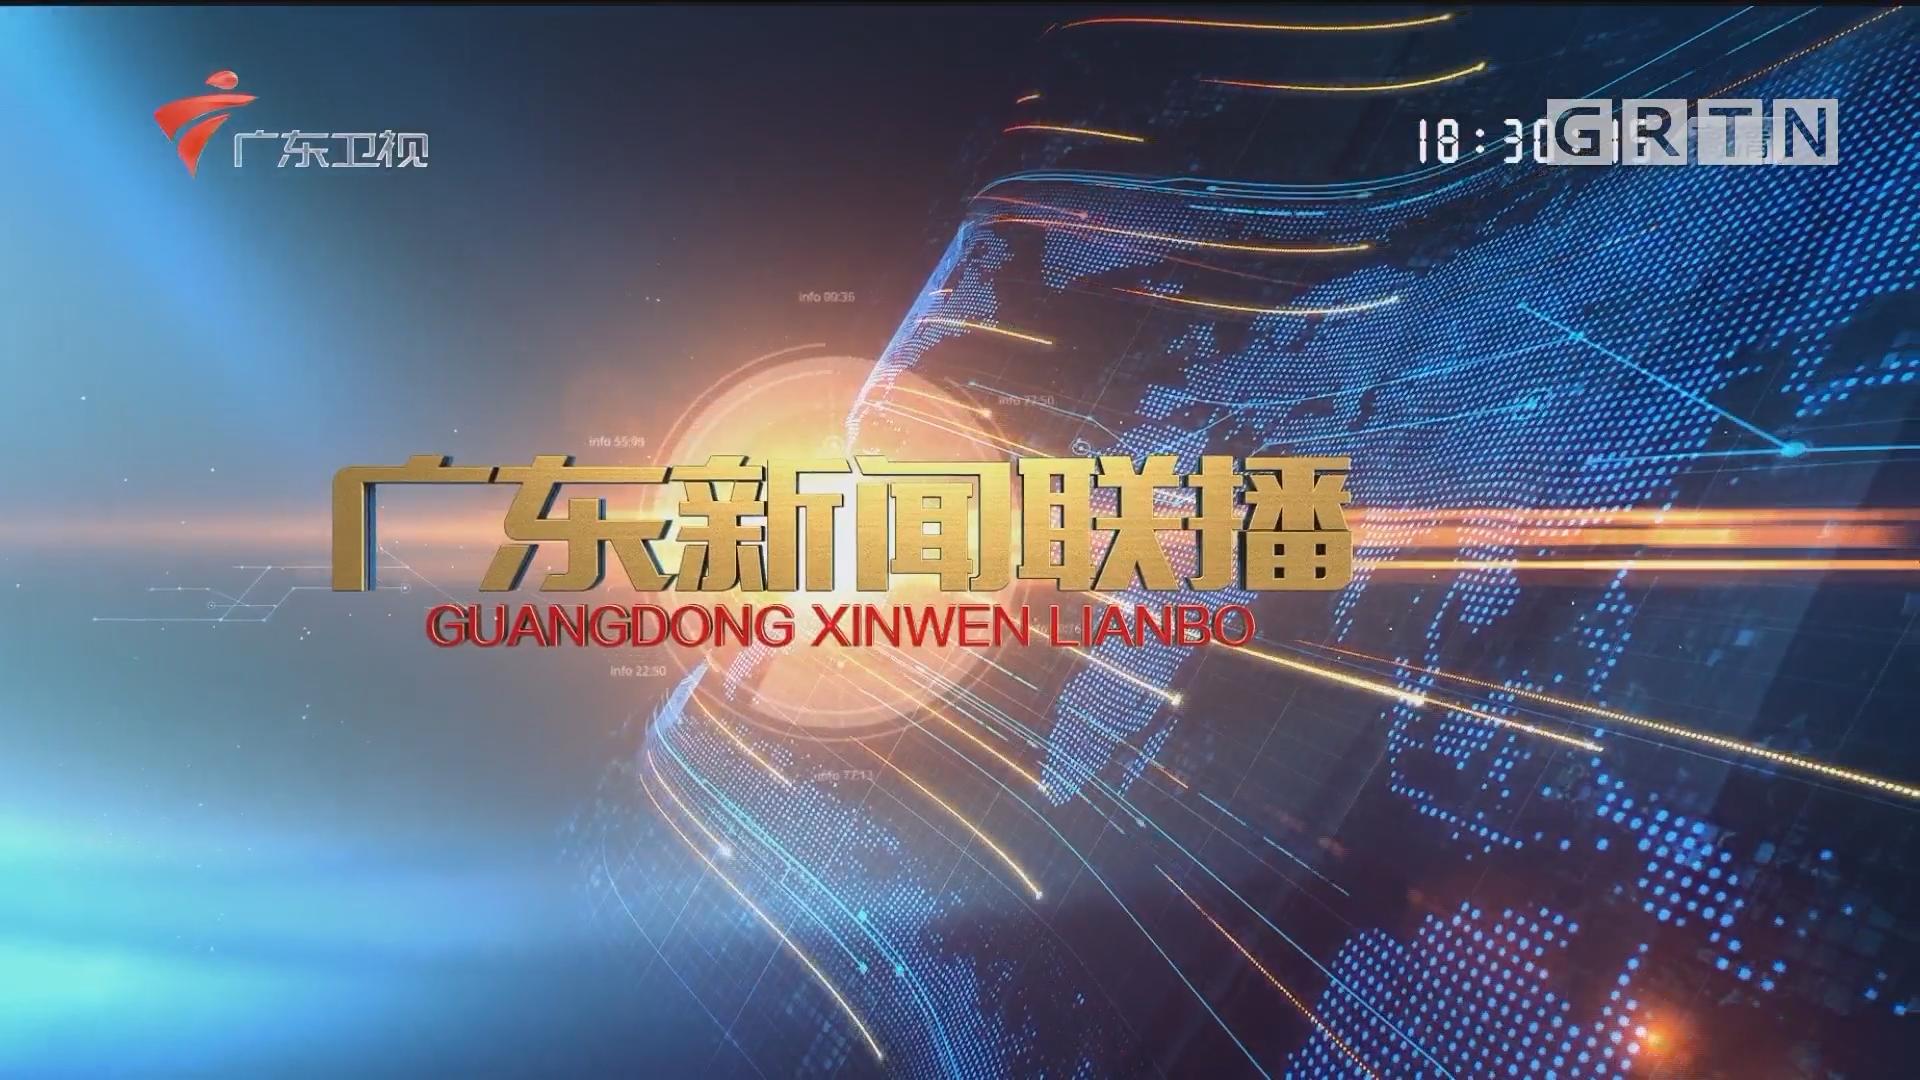 [HD][2017-09-11]广东新闻联播:马兴瑞出席全省计生工作电视电话会议 压实各级责任 优化公共服务 提升管理水平